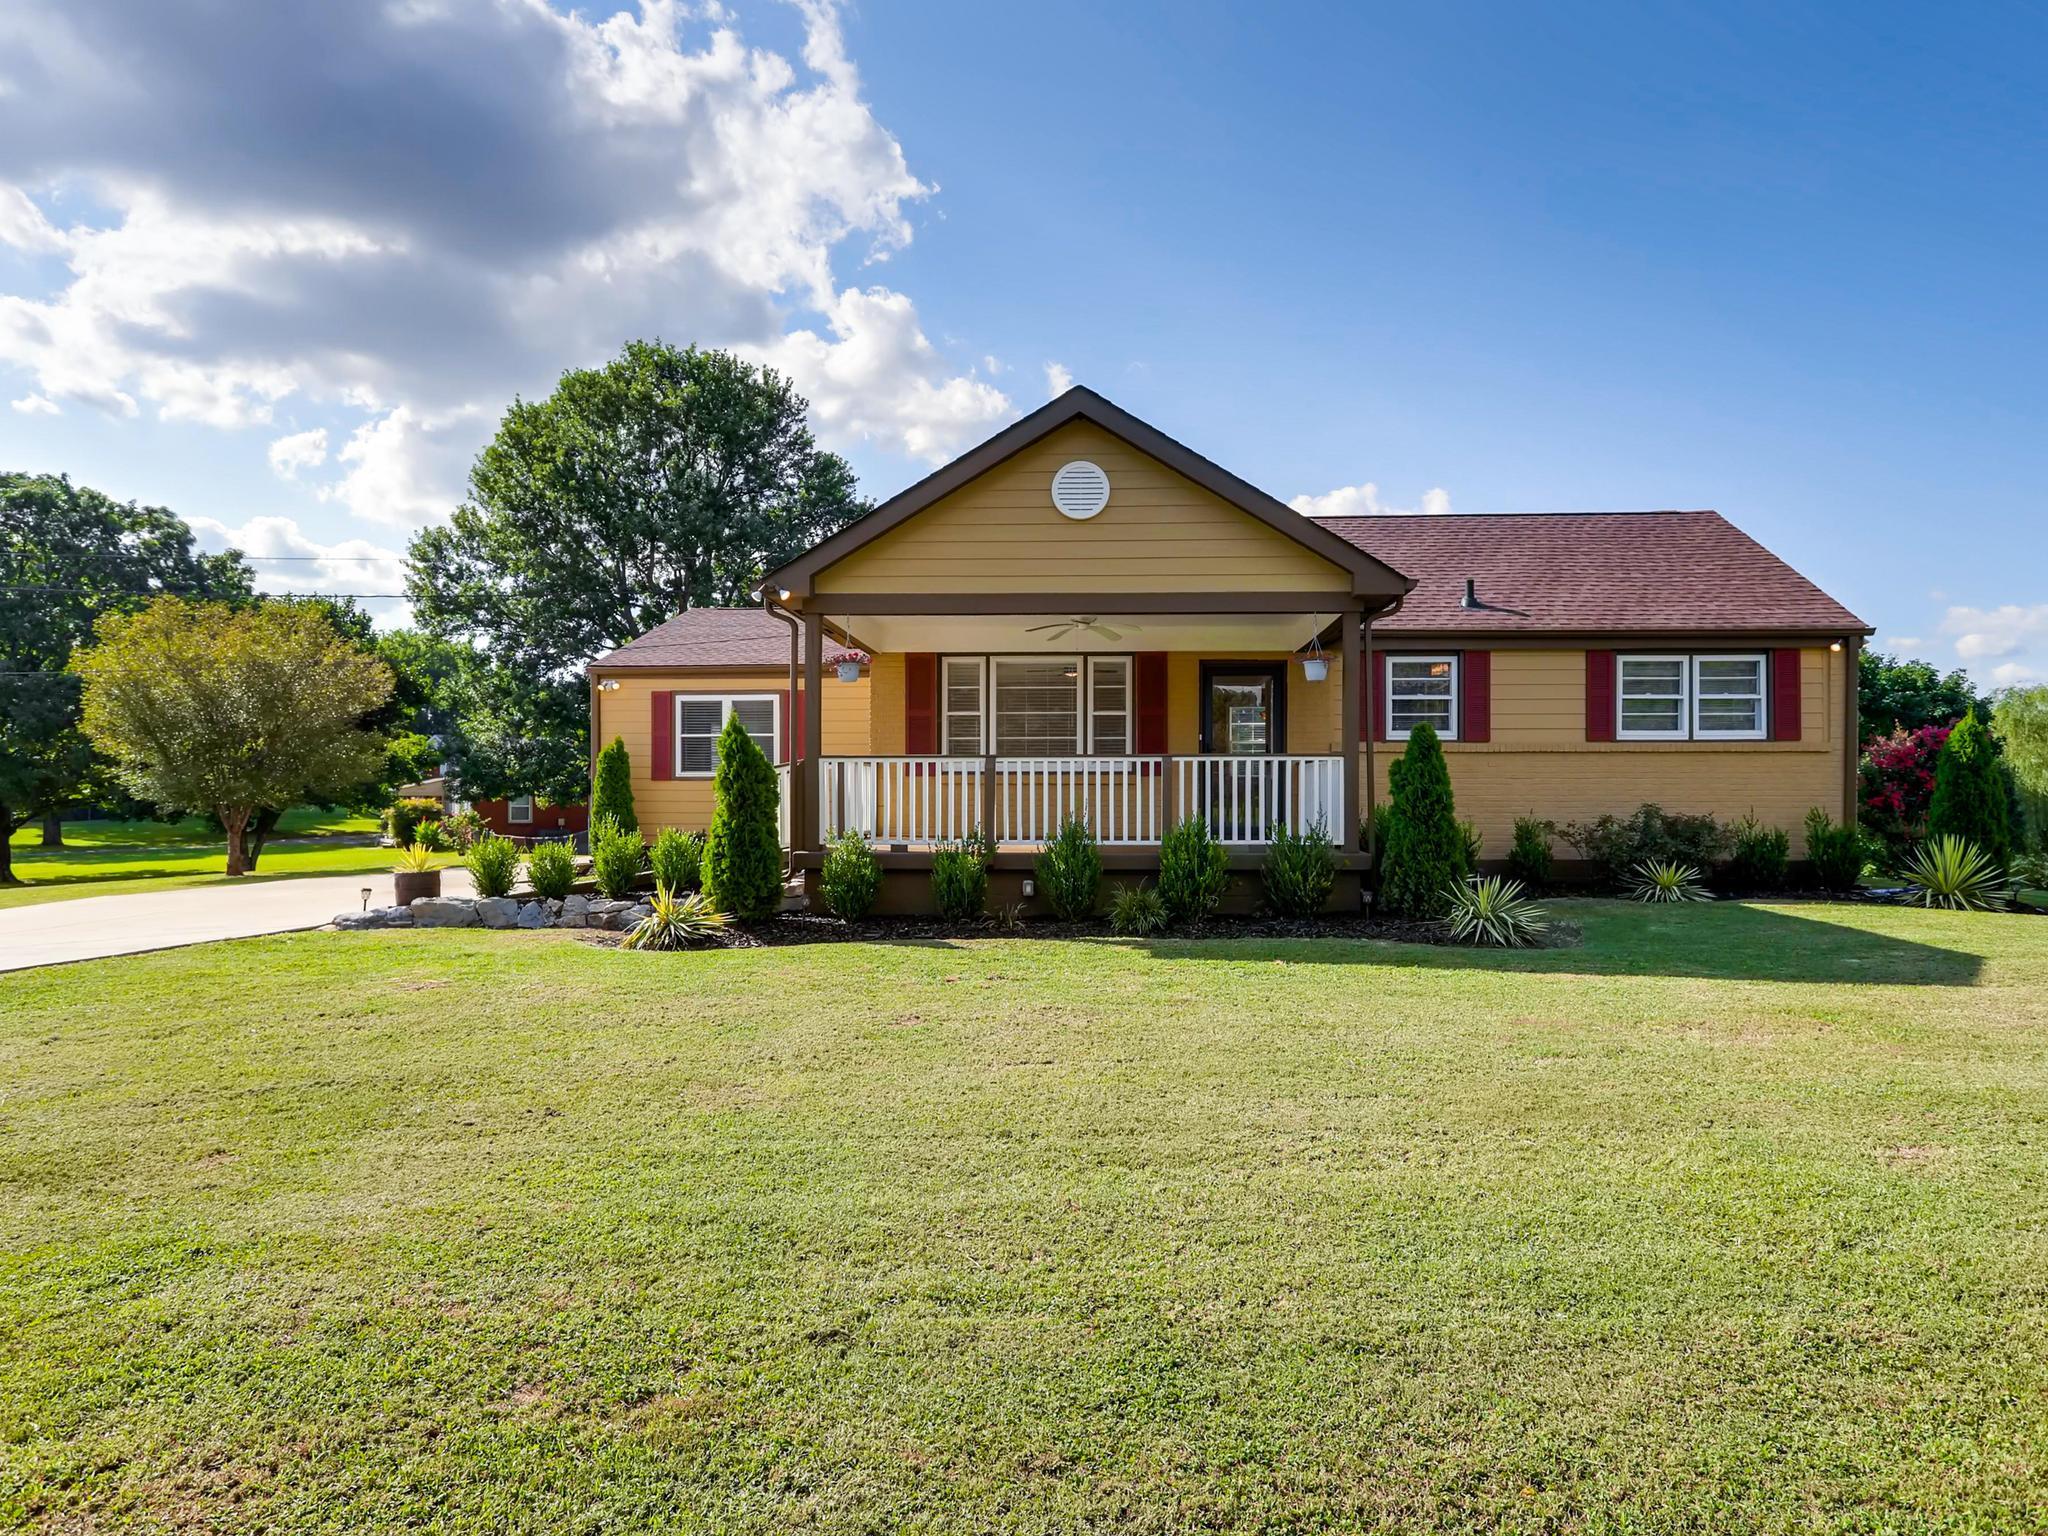 525 VINSON, Nashville, TN 37217 - Nashville, TN real estate listing